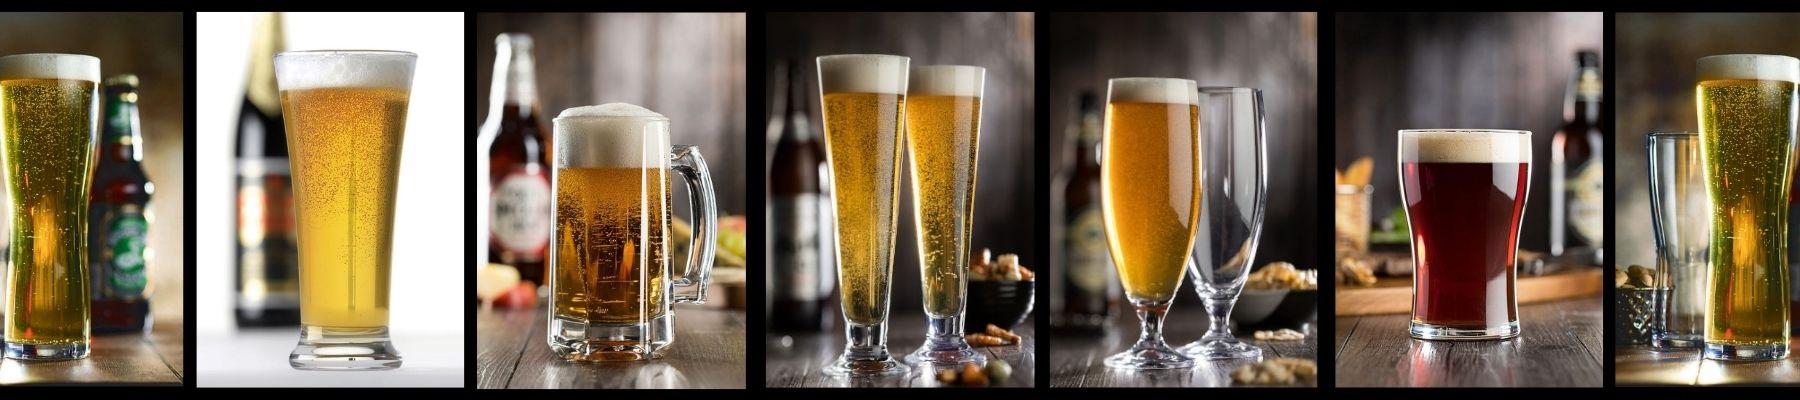 Utopia Beer Pint Craft Glasses